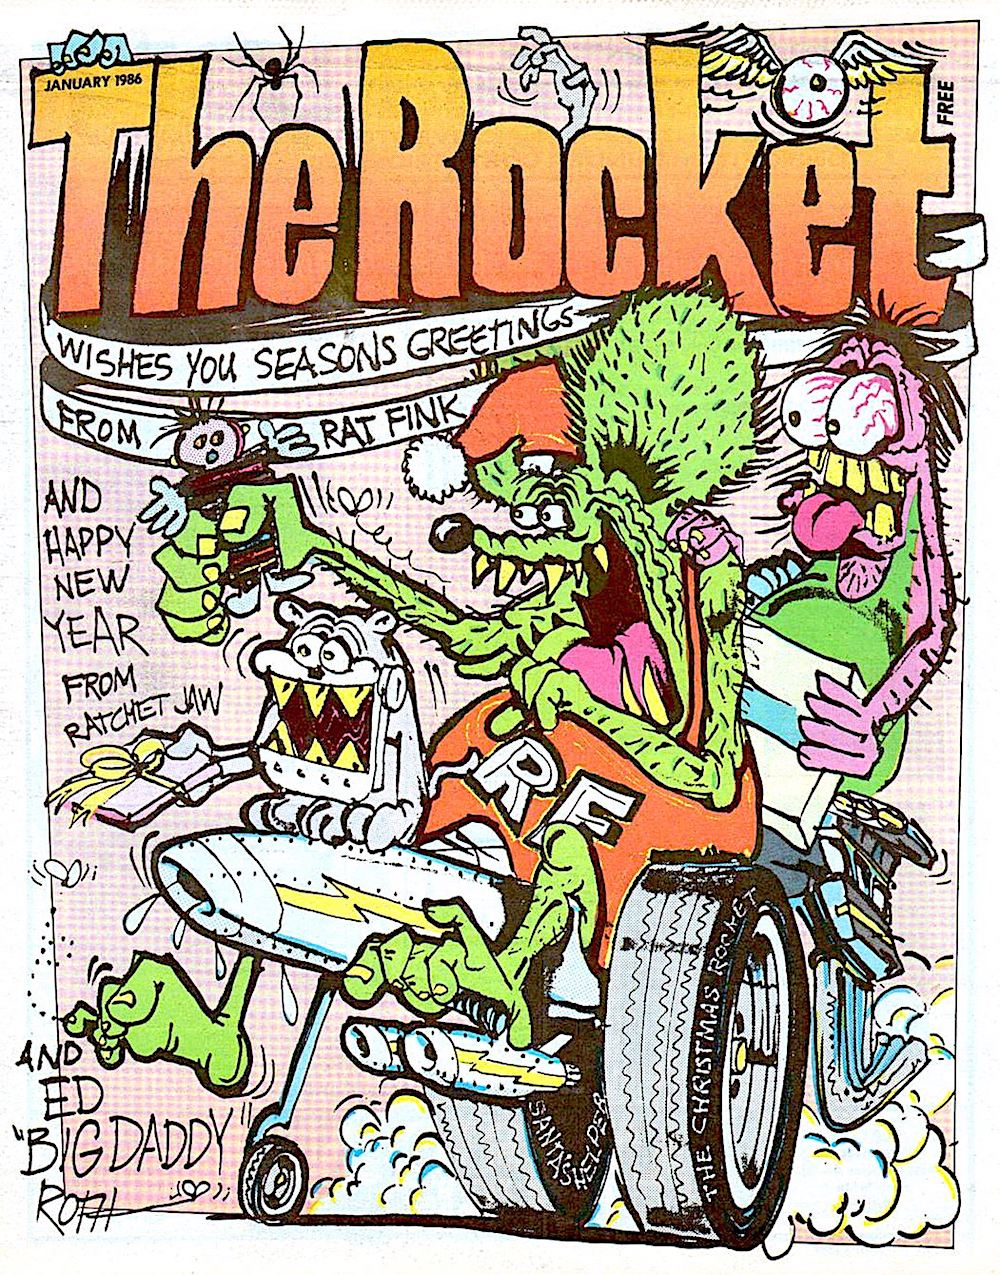 Ed Roth Rat Fink, the Rocket, Big daddy